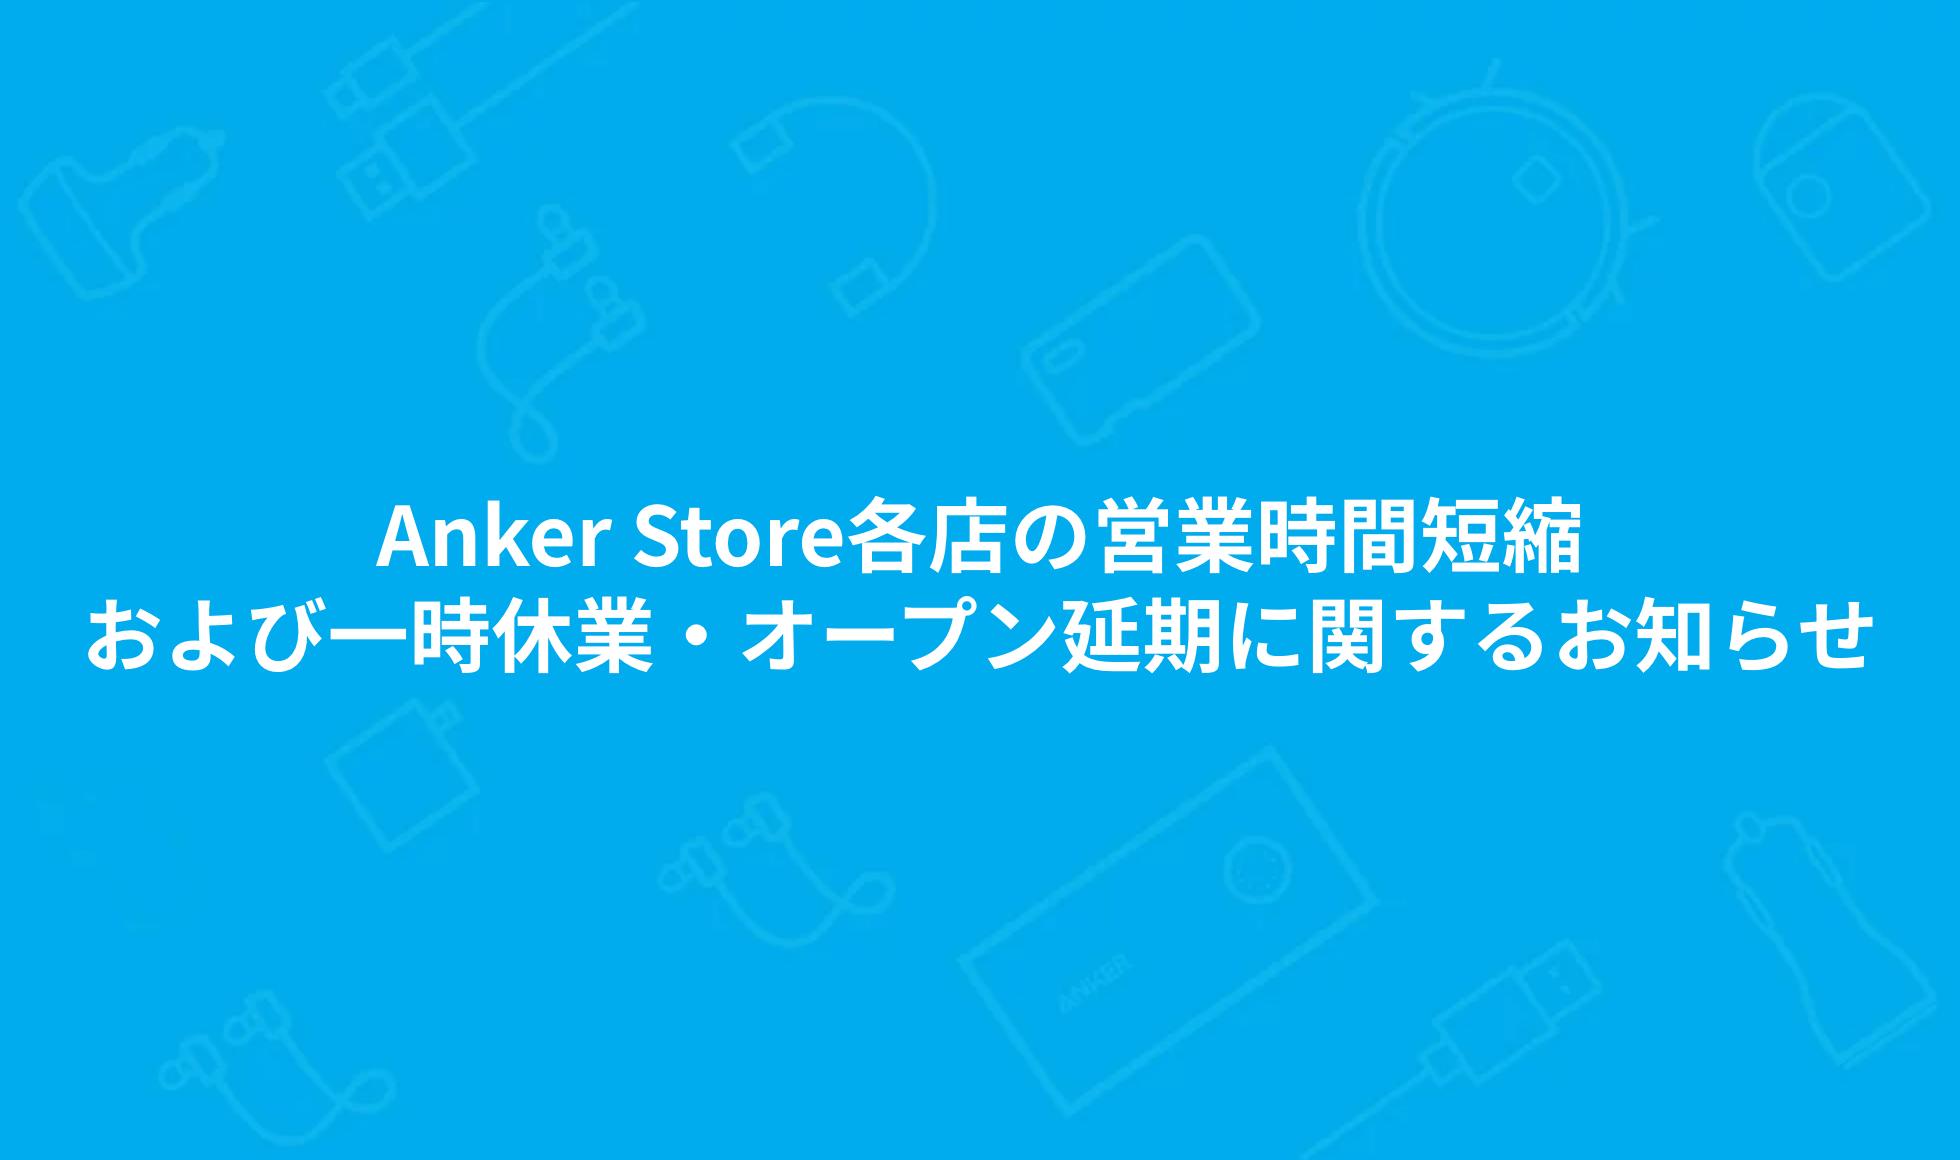 anekr-store